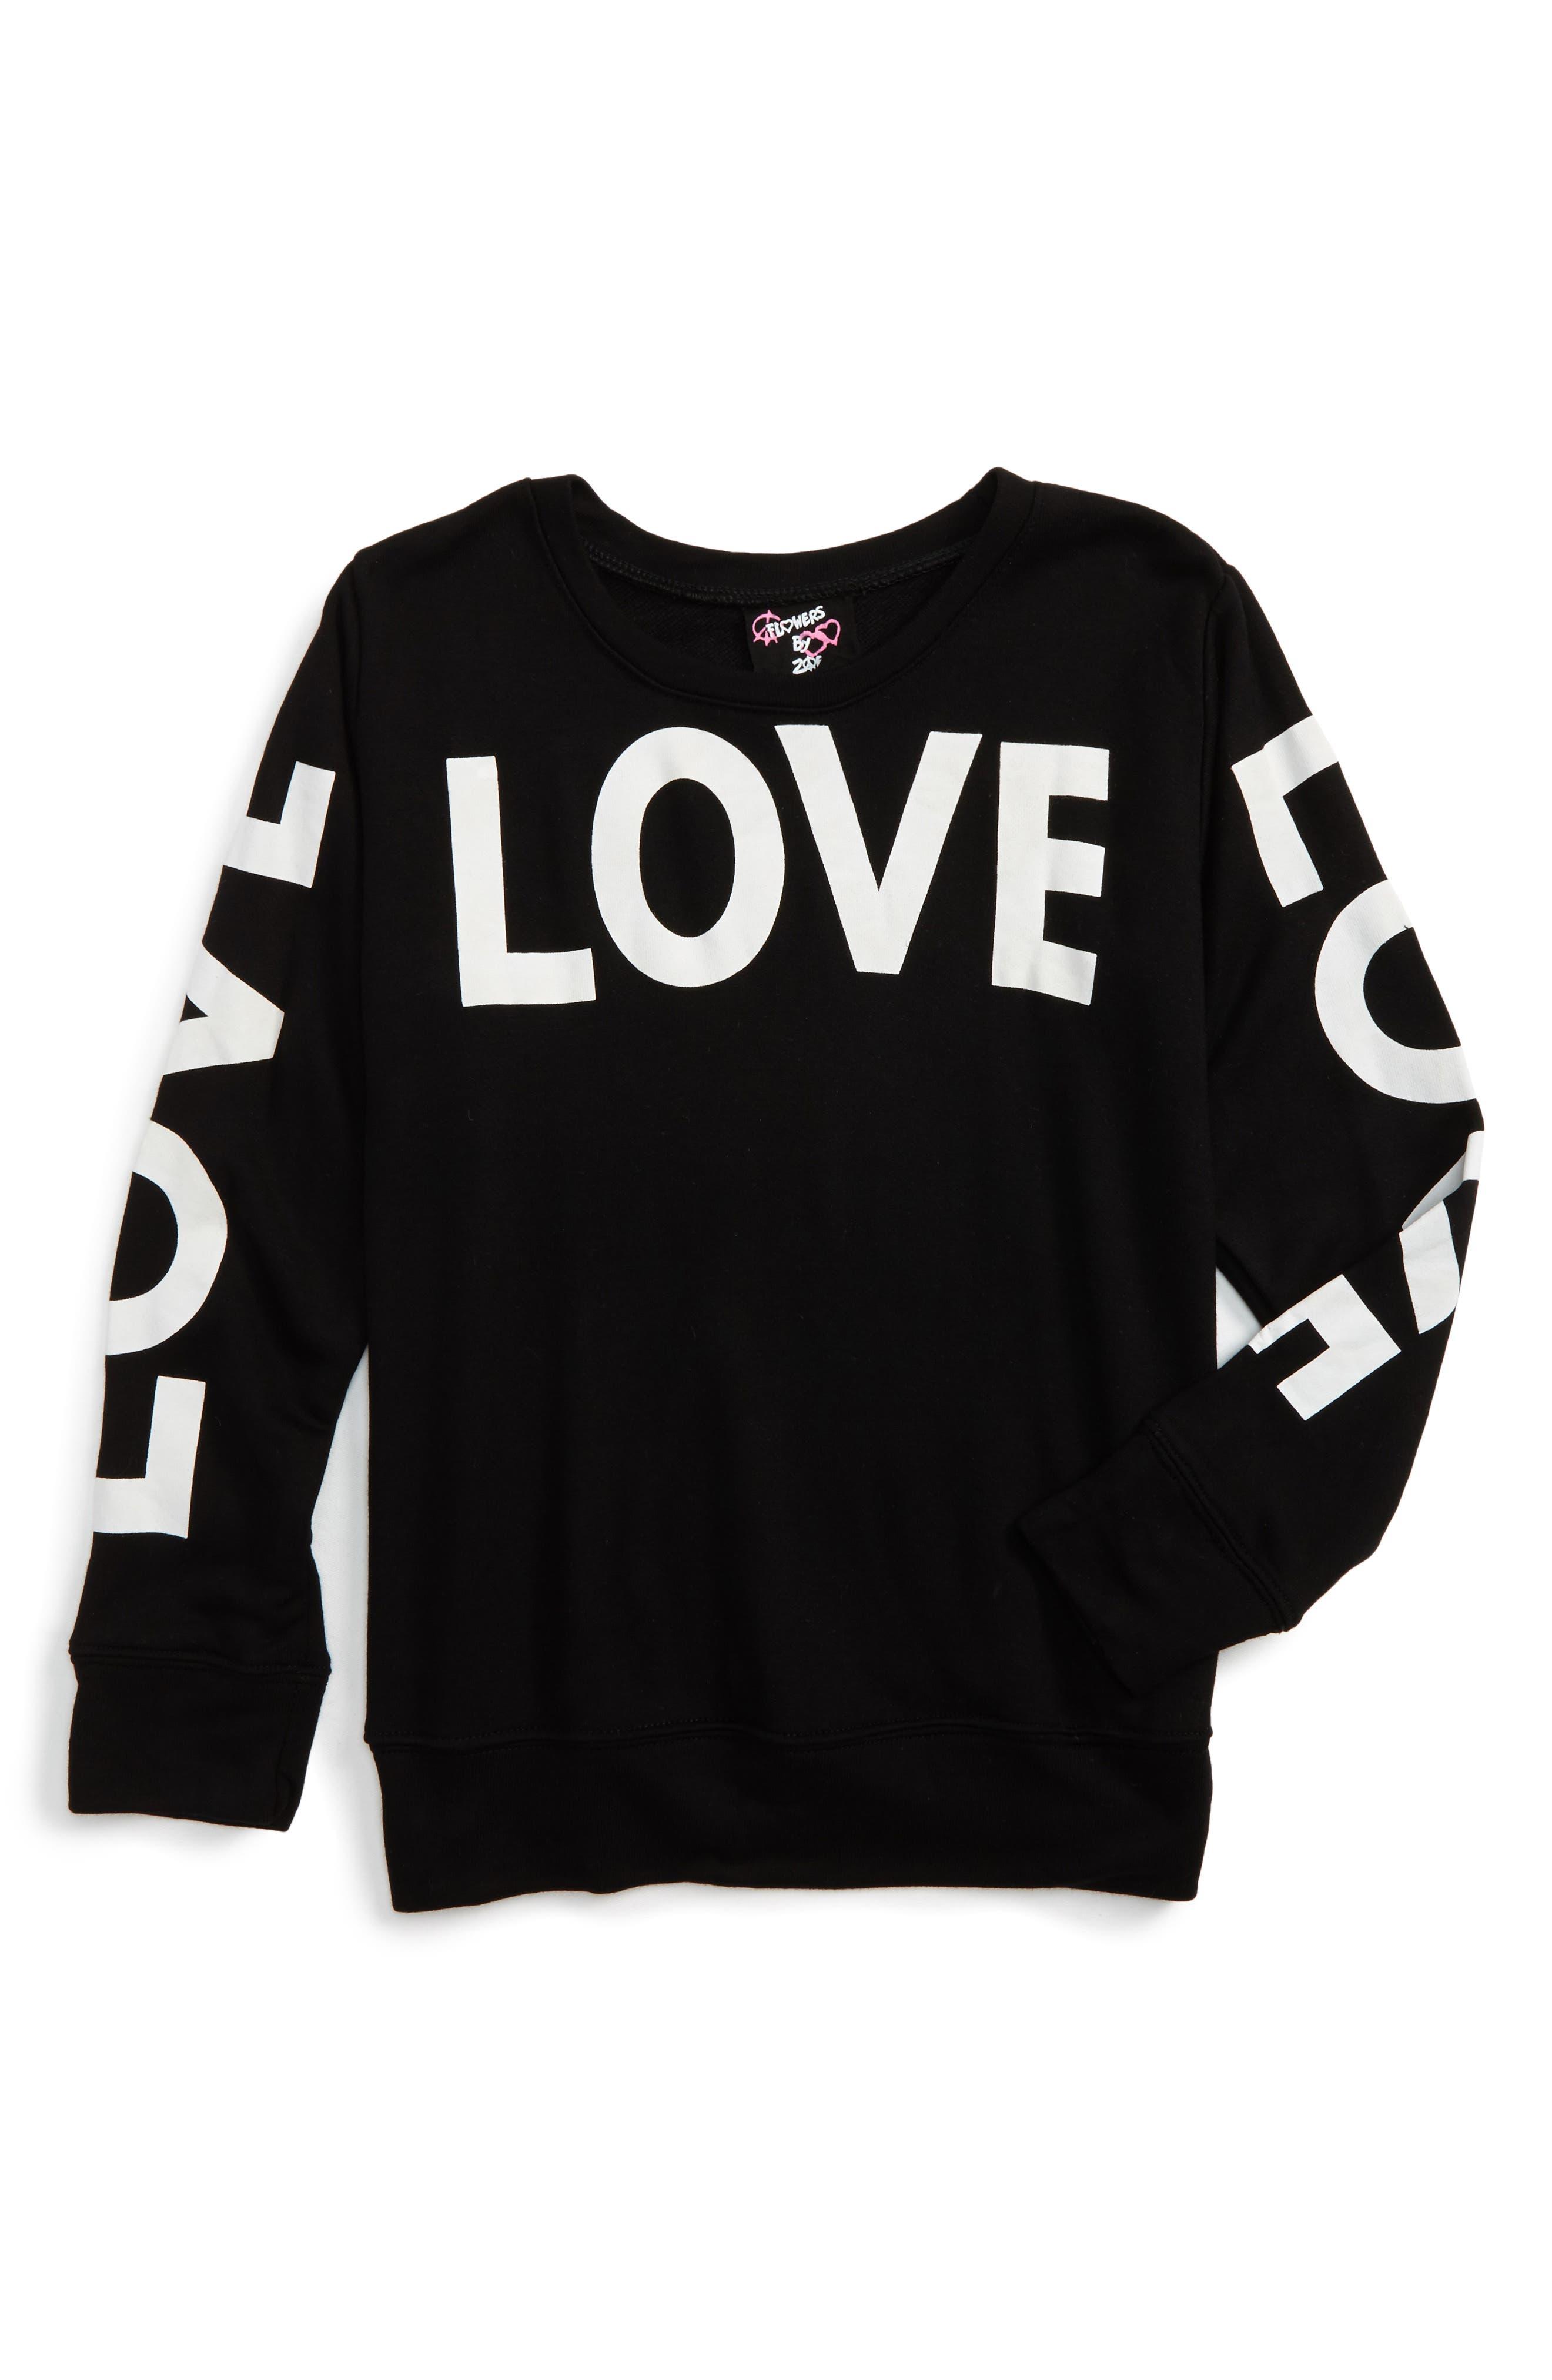 Love Sweatshirt,                         Main,                         color, Black-3Love-White